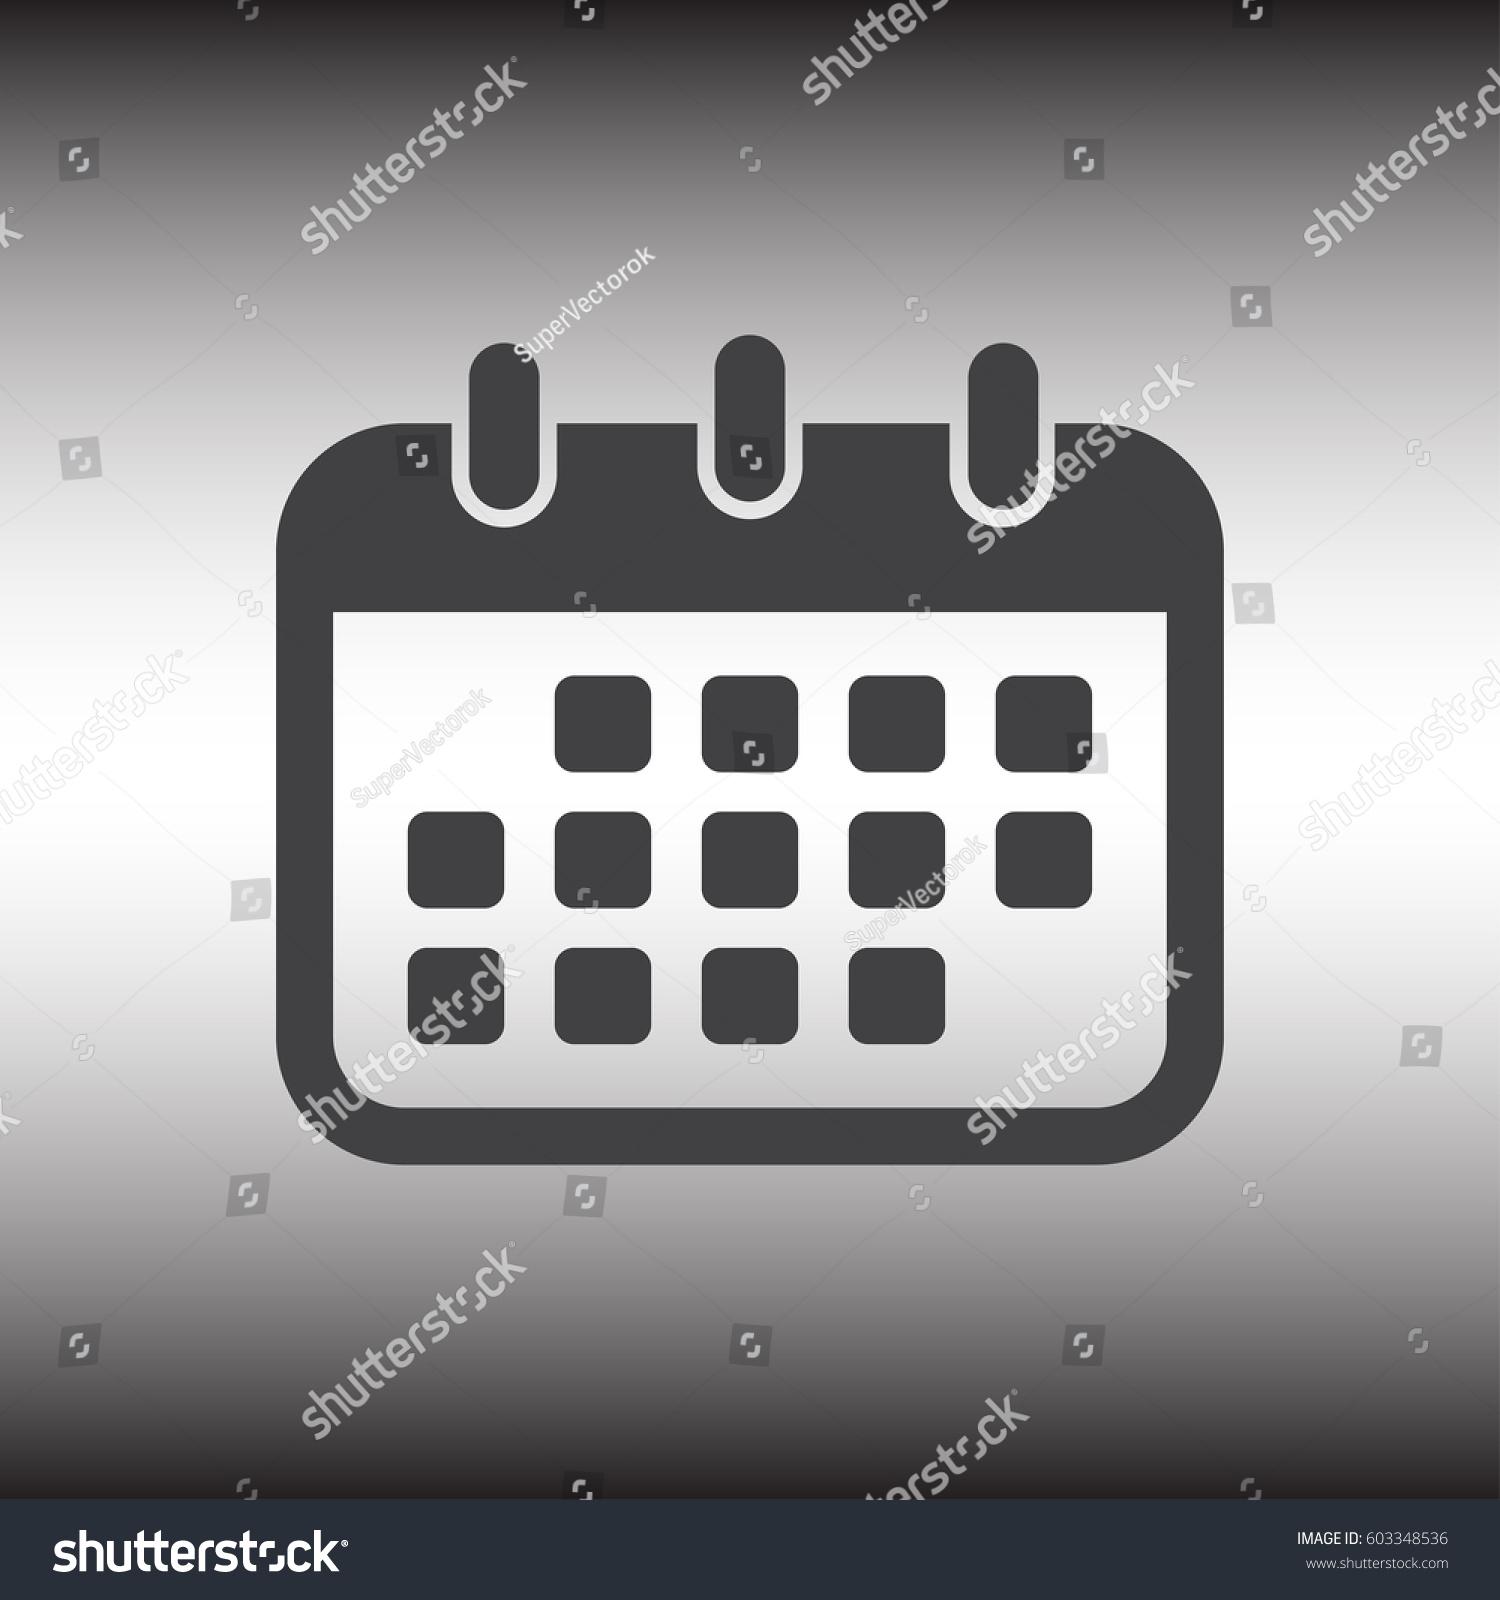 Calendar Flat Illustration : Calendar icon vector illustration flat design stock